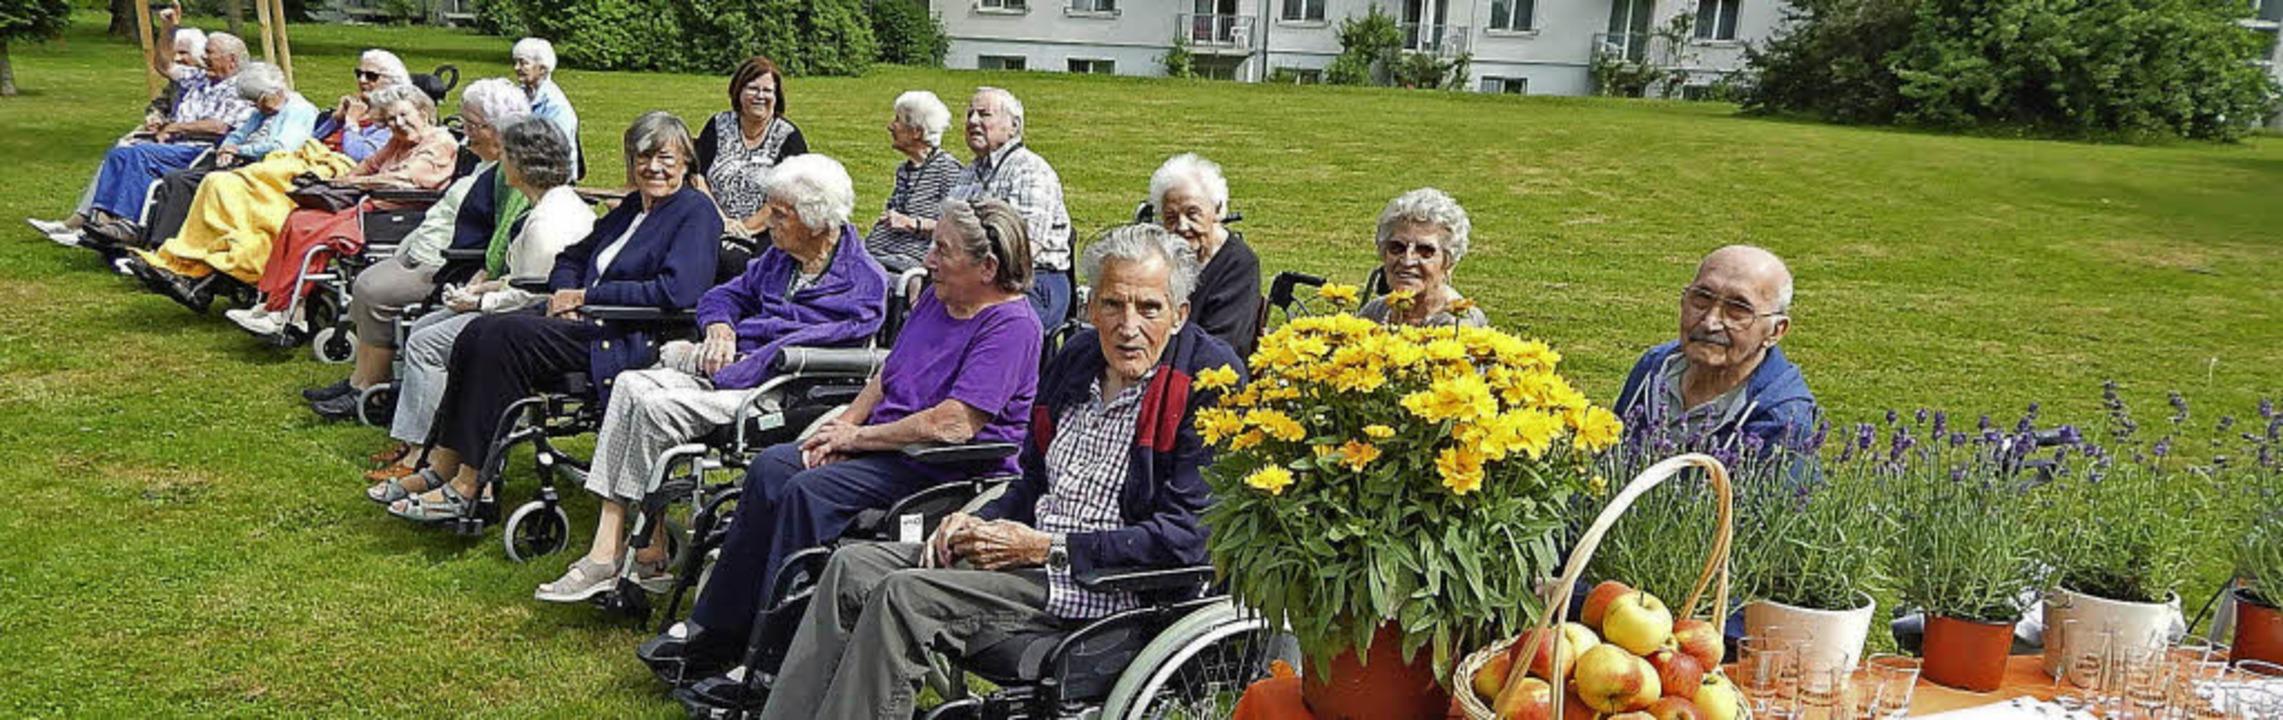 Senioren aus dem Bürgerheim freuten si... Beruf des Landschaftsgärtners übten.     Foto: Claudia Gempp